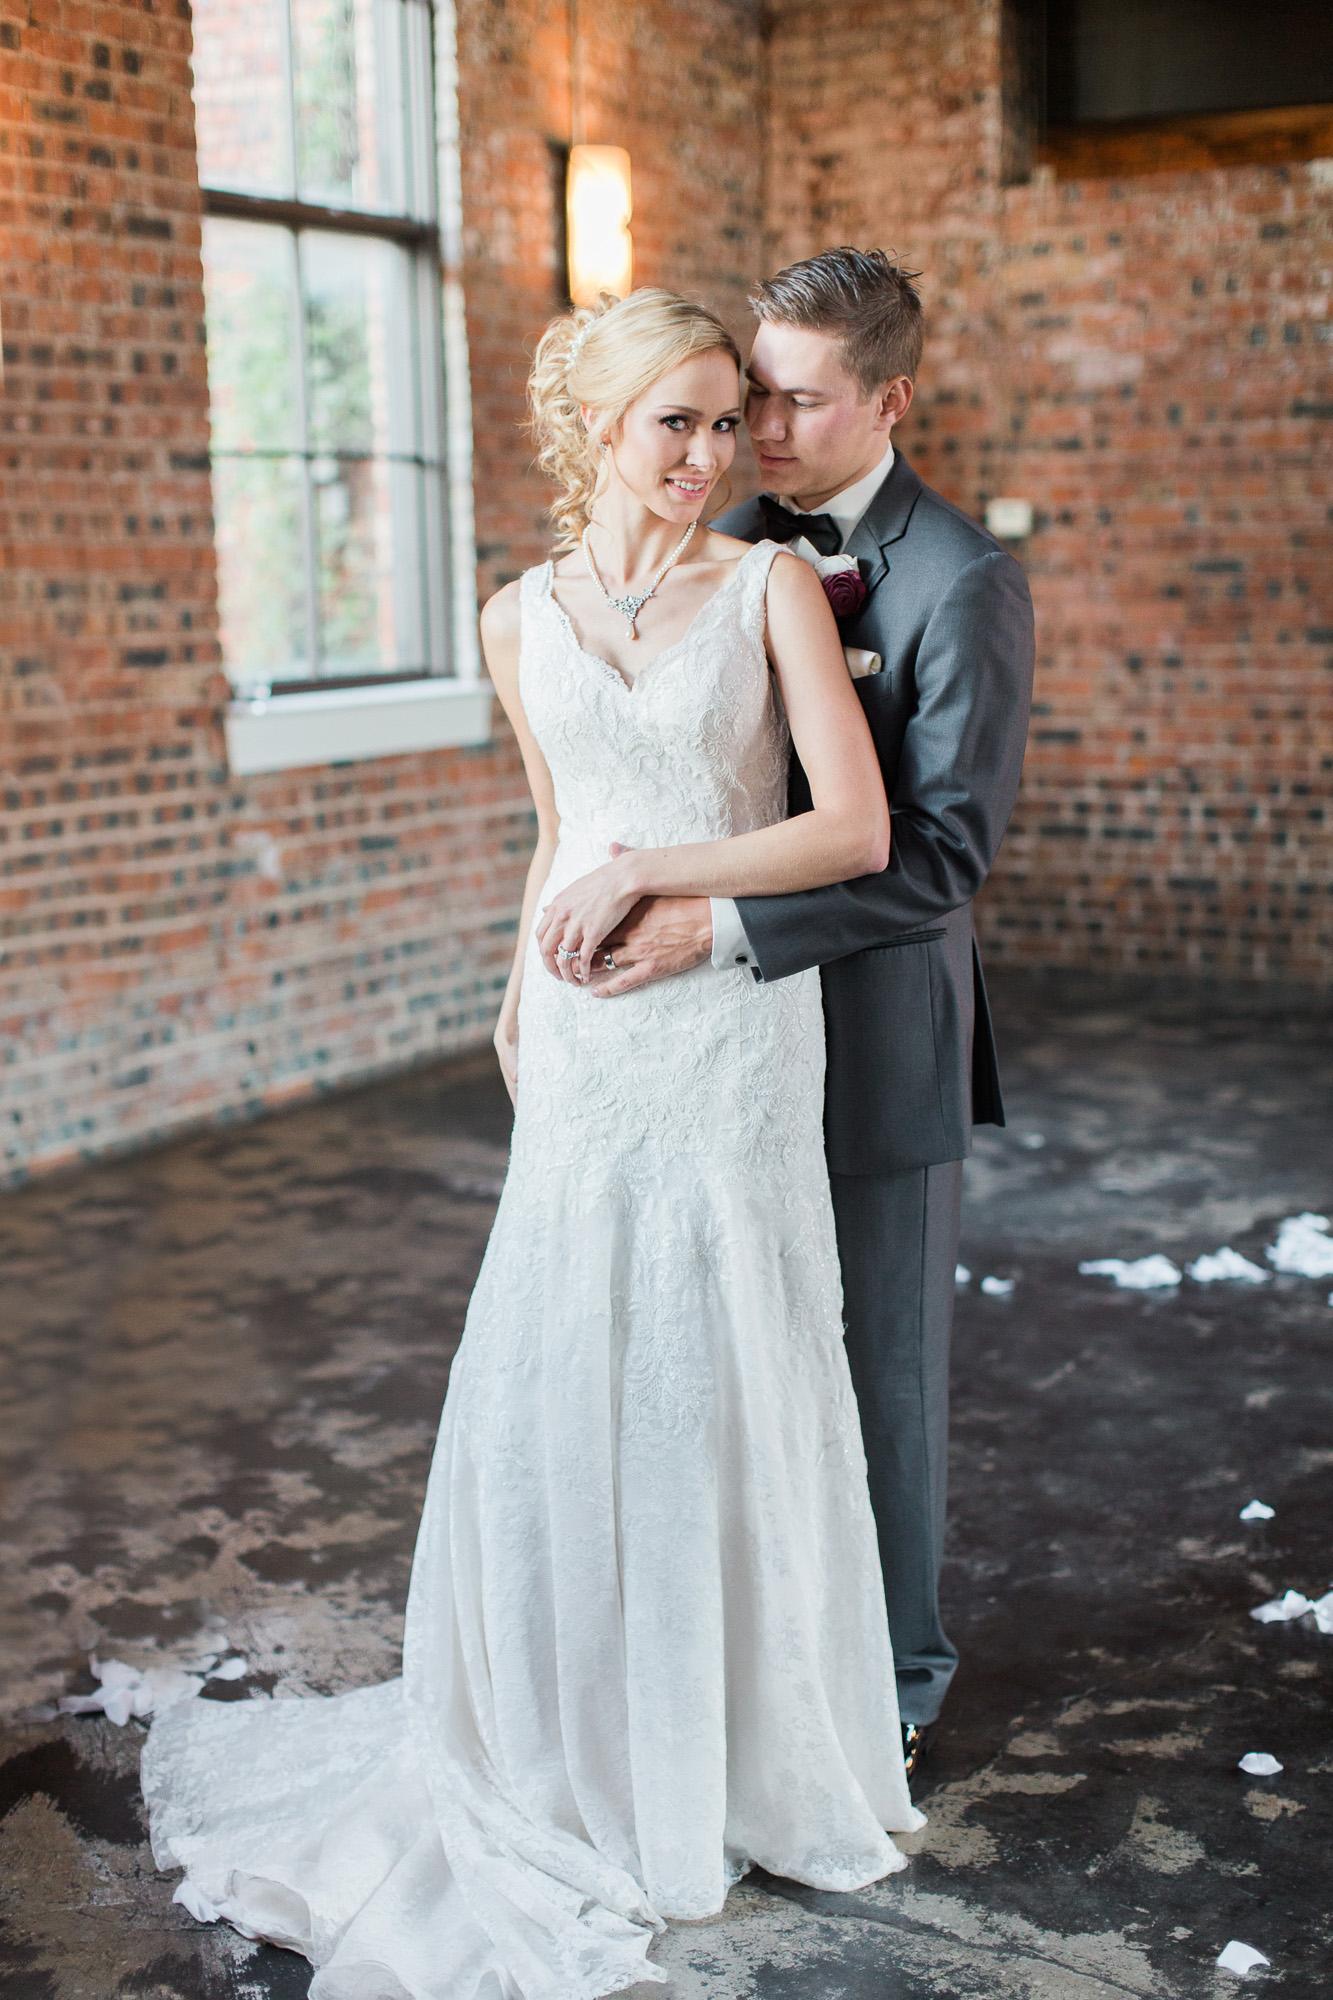 b0470-downtown-bryan-weddingdowntown-bryan-wedding.jpg